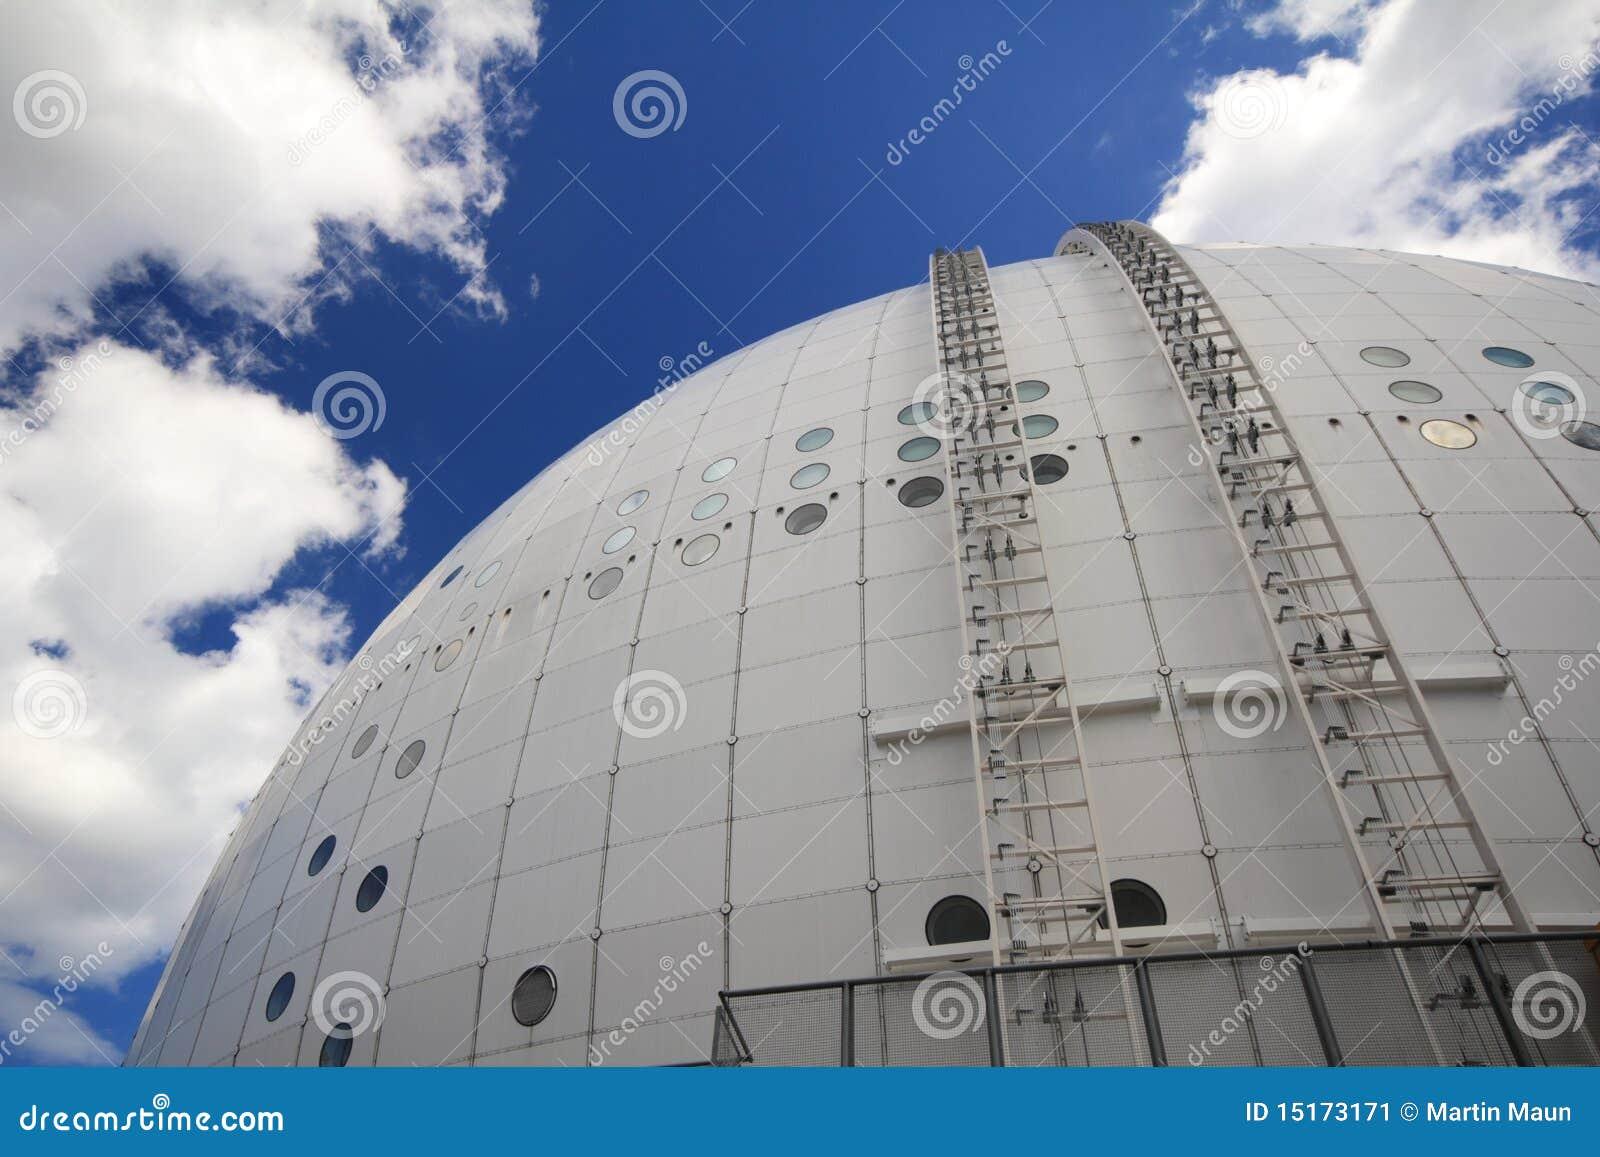 The Ericsson Globe